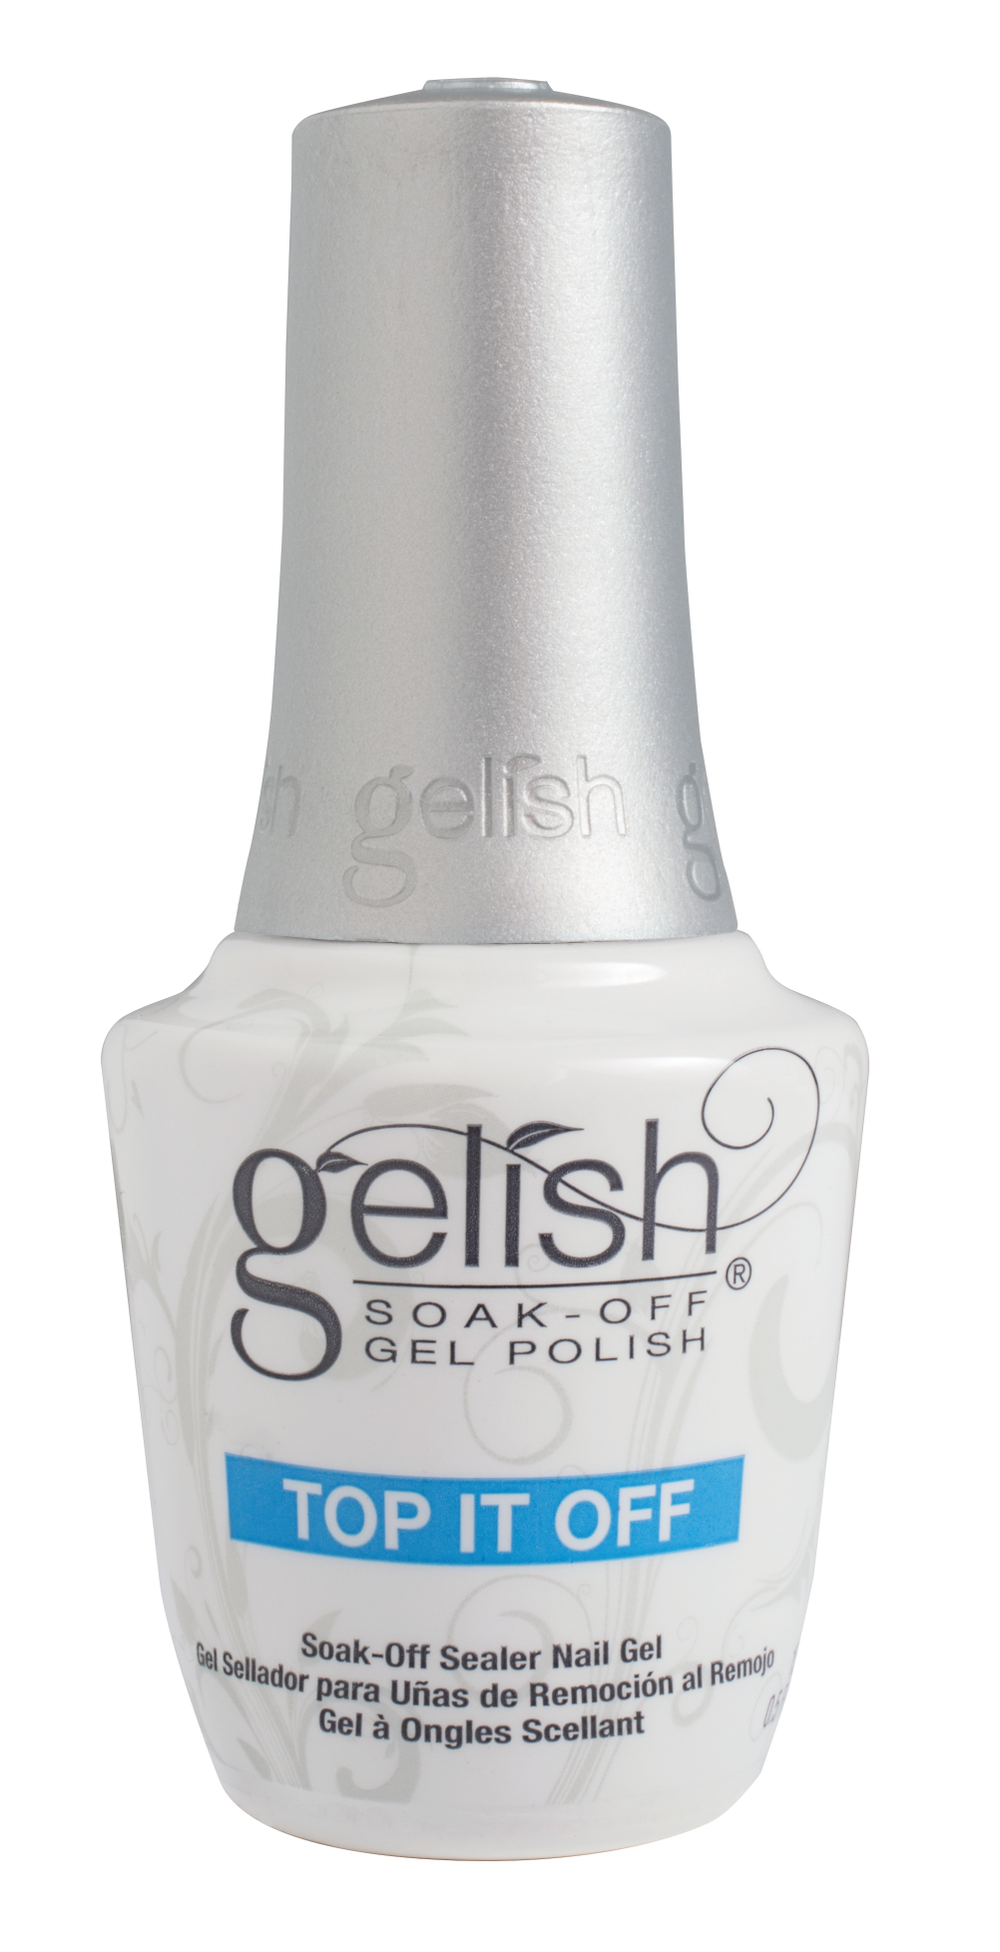 "<p>Gelish Top It Off Soak-Off Sealer Gel </p> <p><a href=""http://www.gelish.com"">www.gelish.com </a></p>"